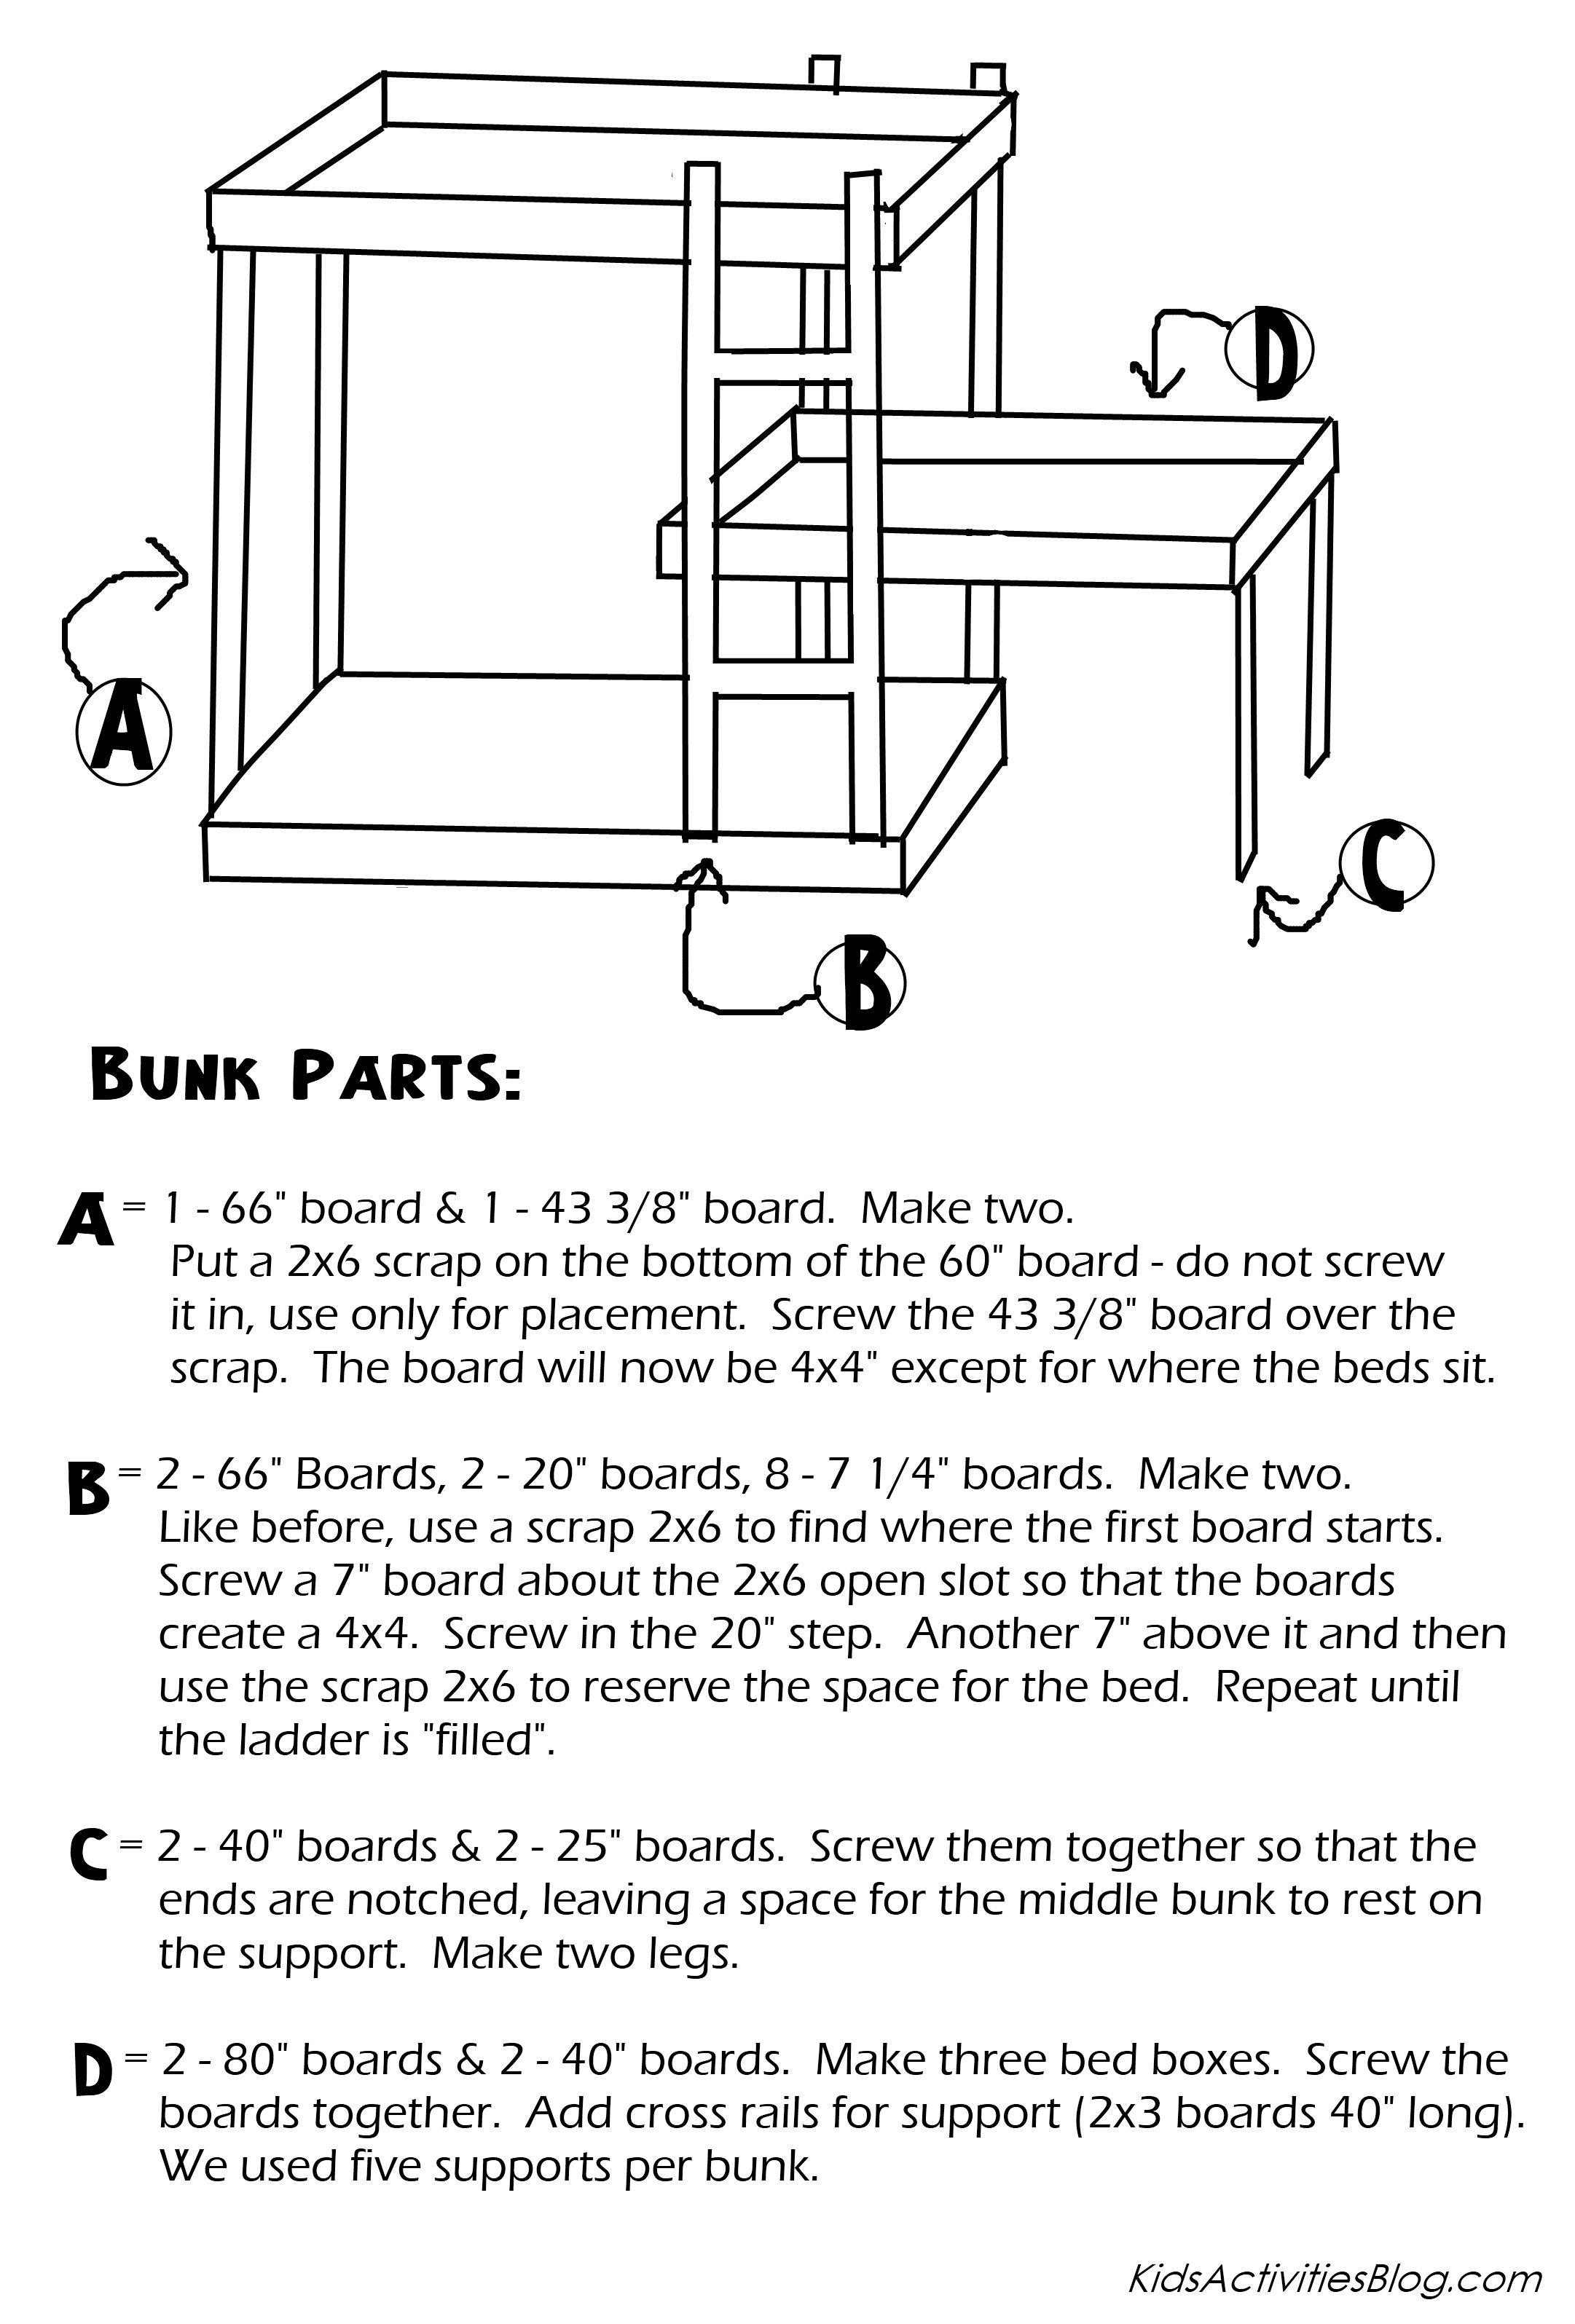 bunk bed plans free pdf